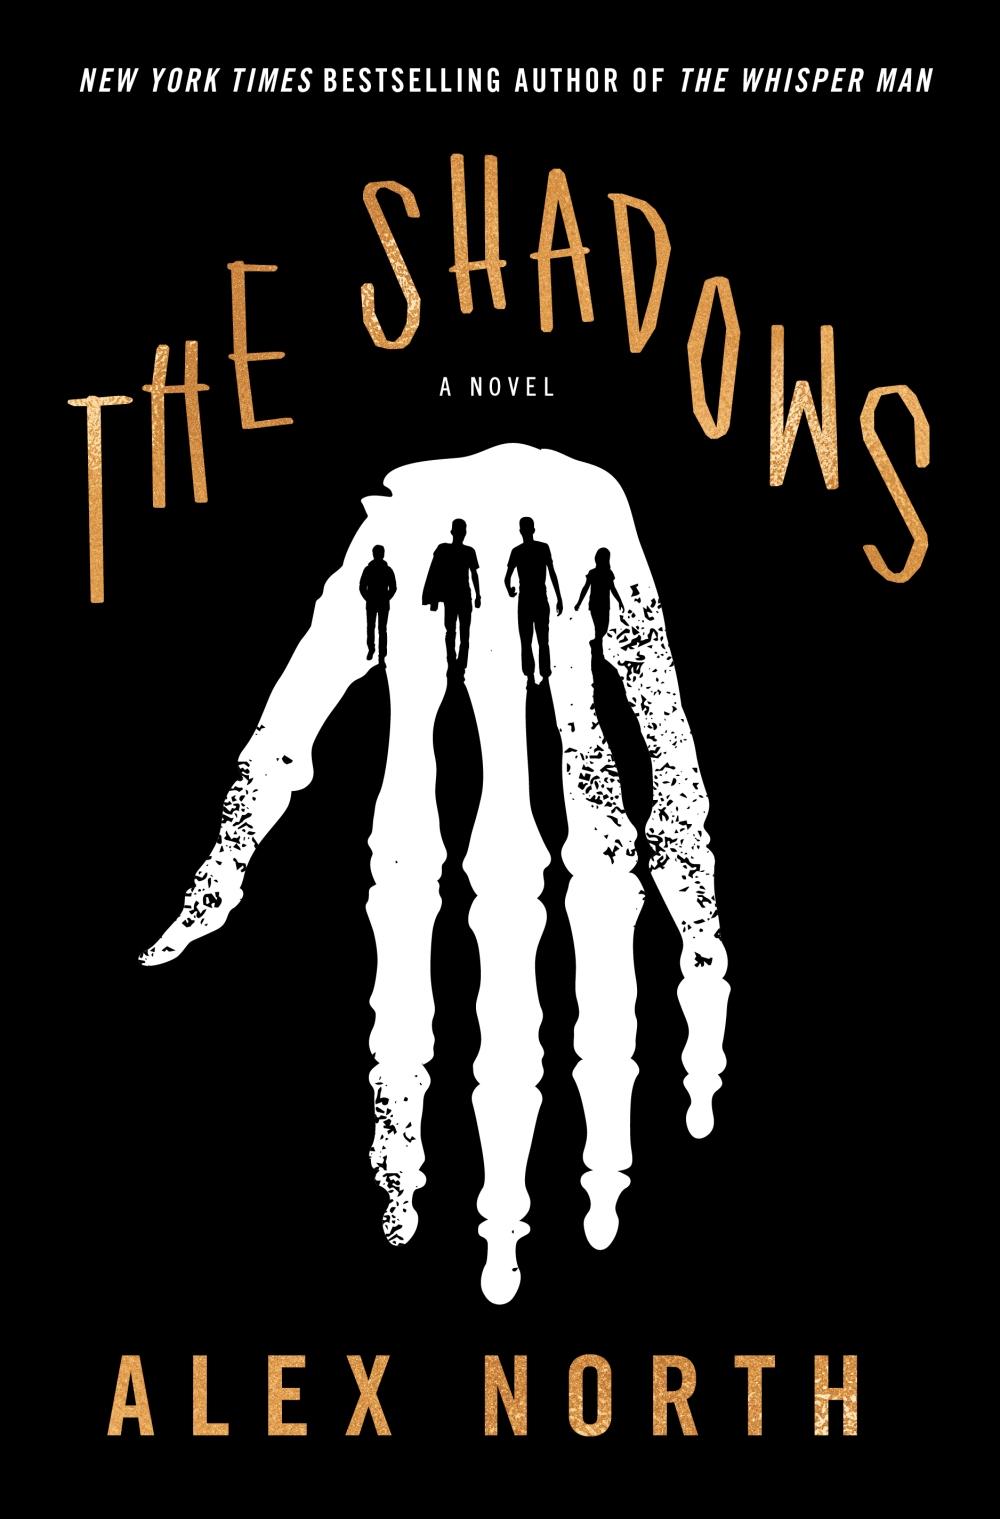 theshadows